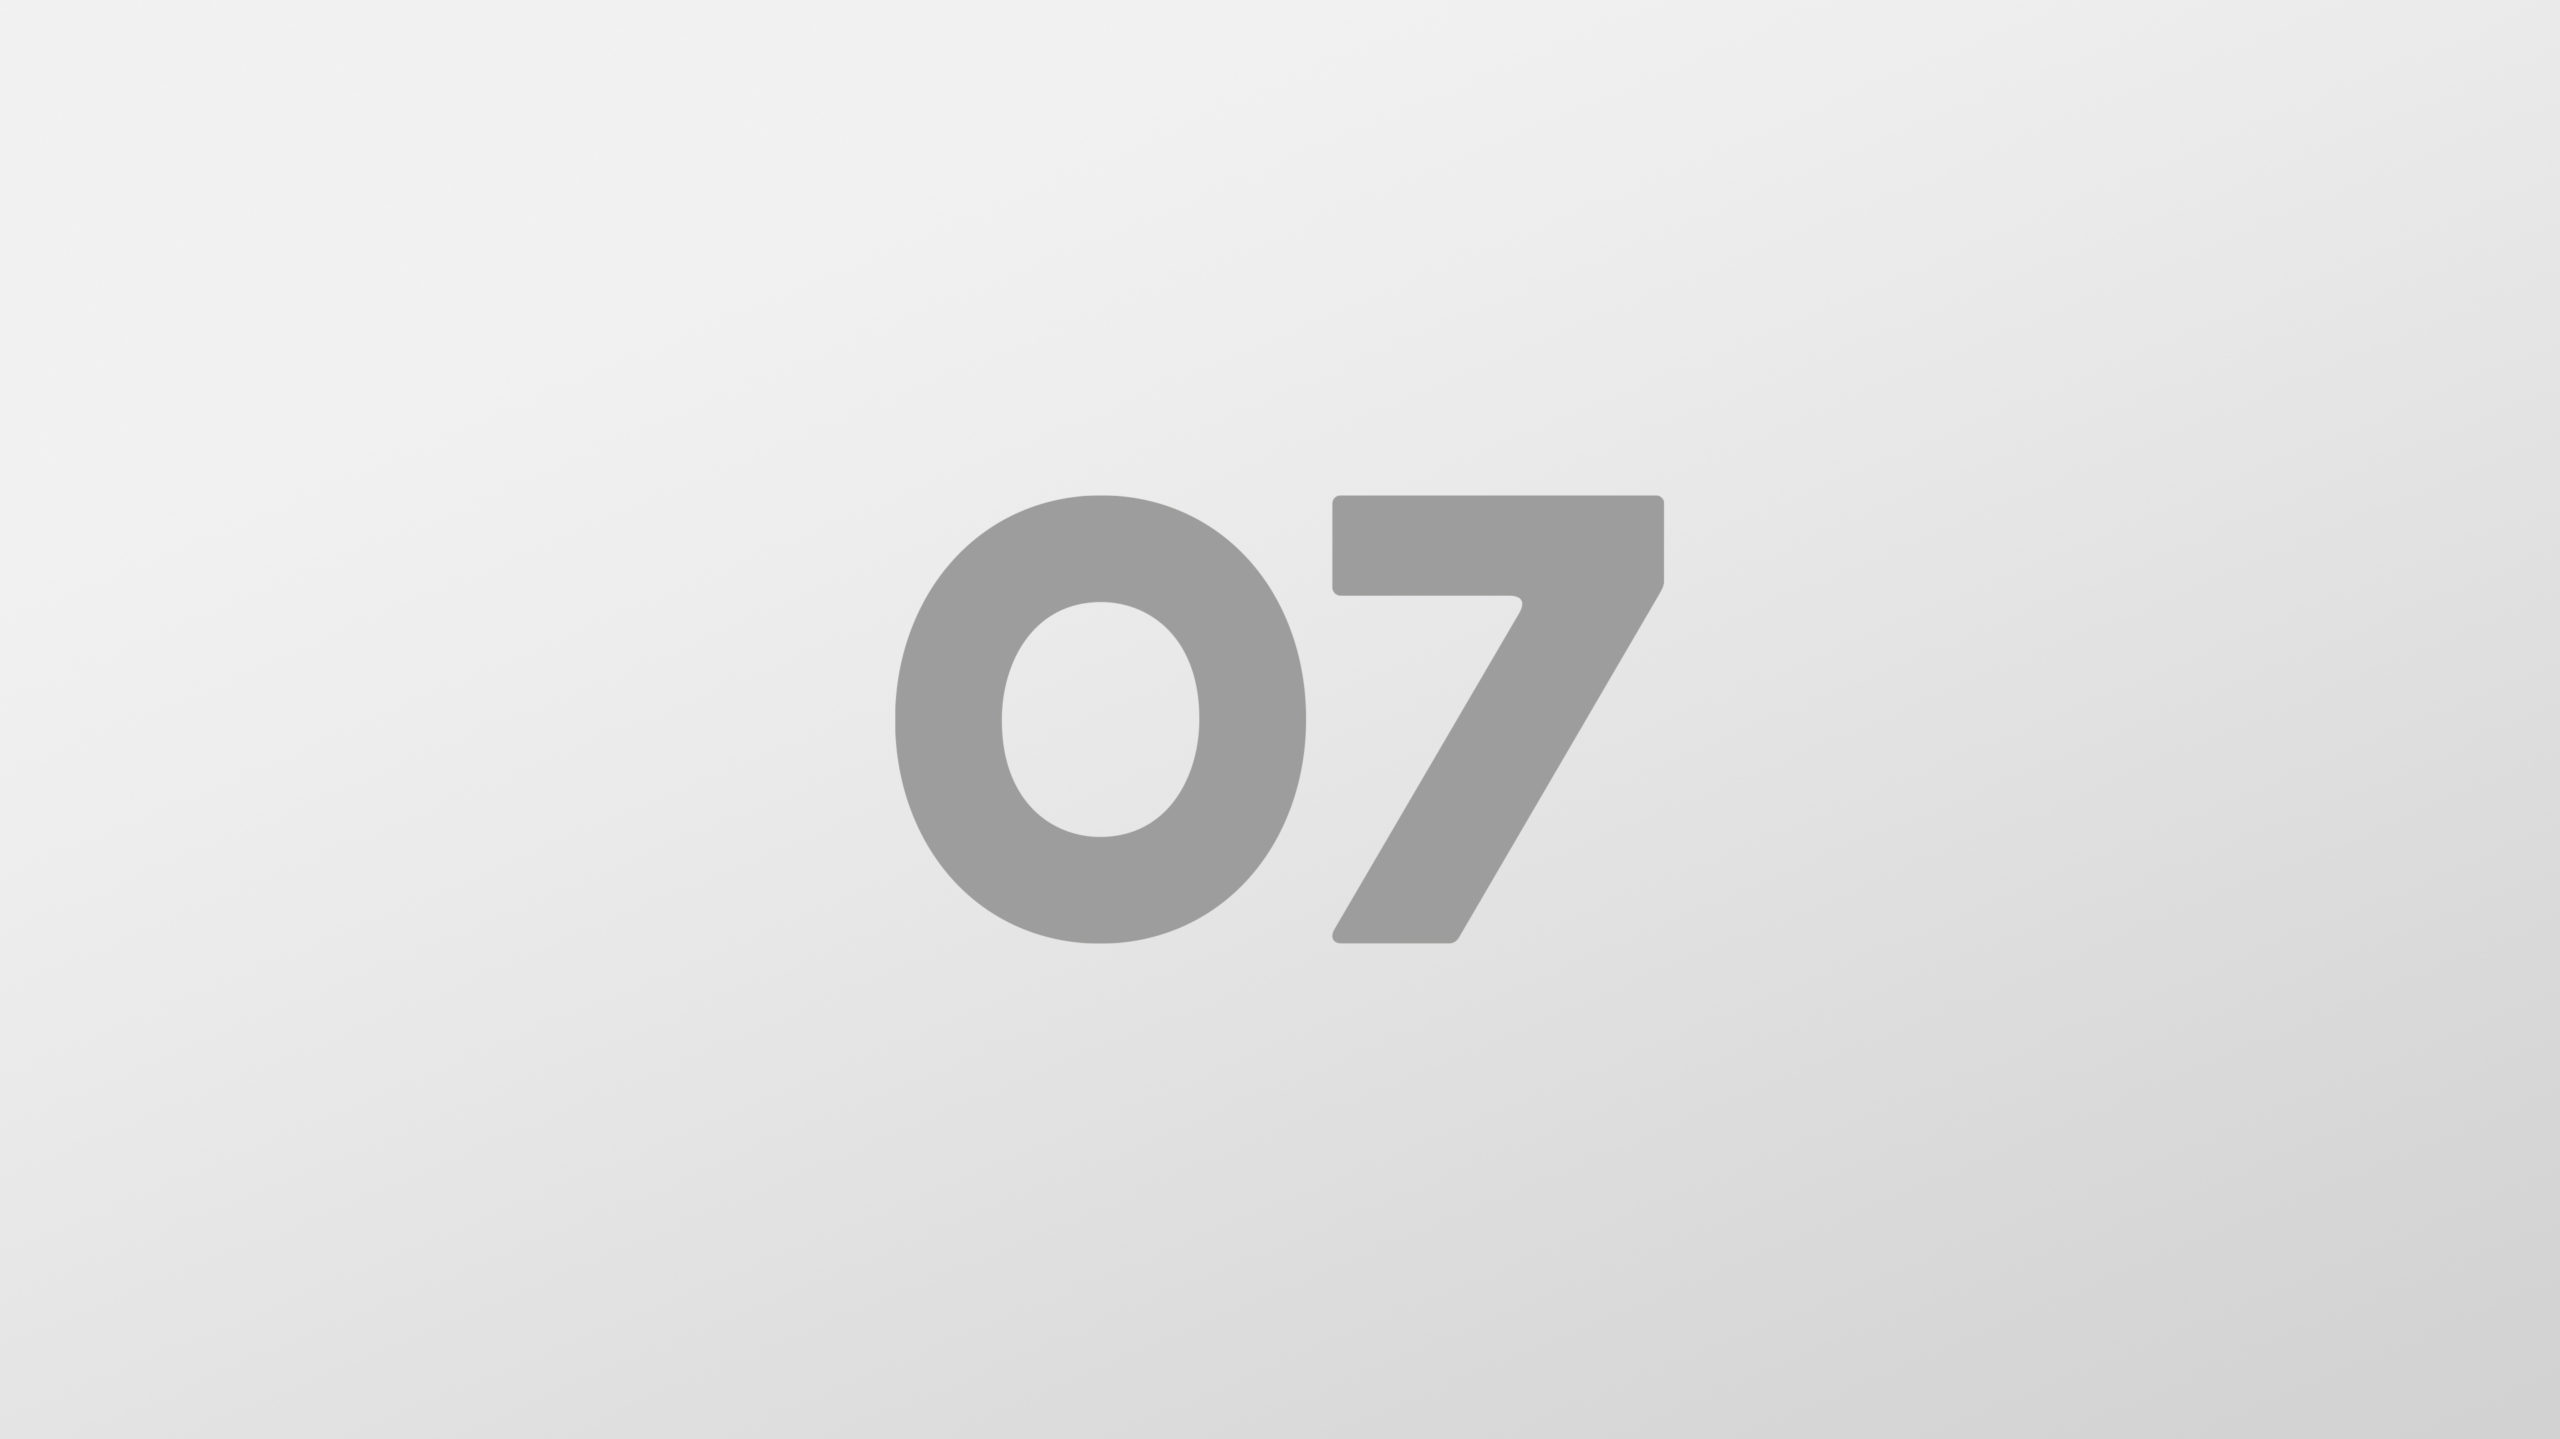 07 Media sin logo. Illustrasjon.